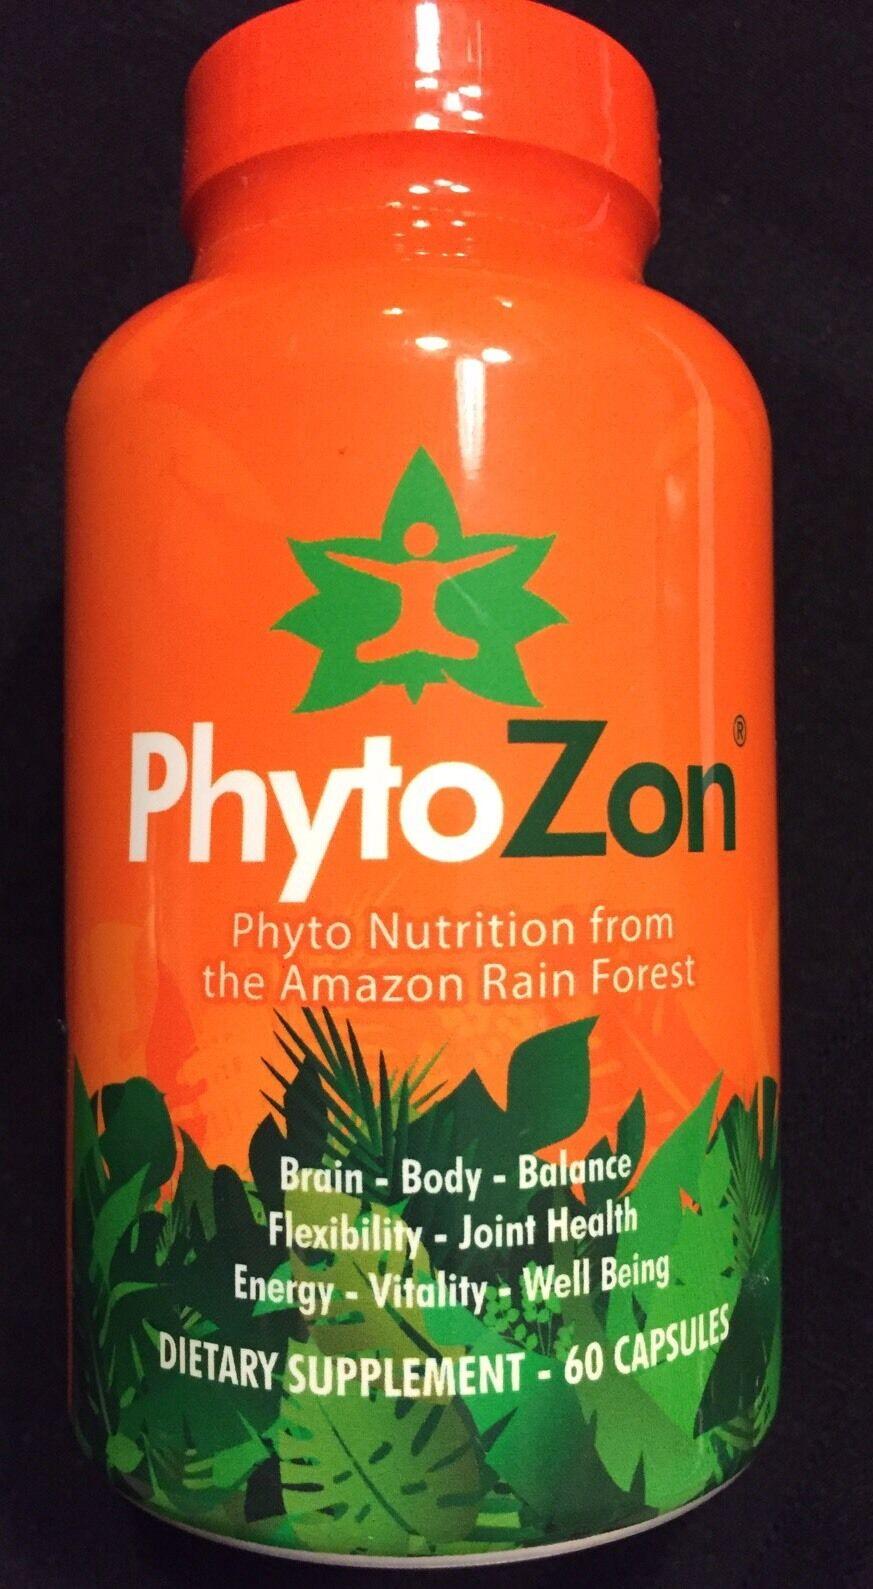 Alli Diet Pill Amazon phytozon nutritional supplement from amazon rain forrest - 60 capsules